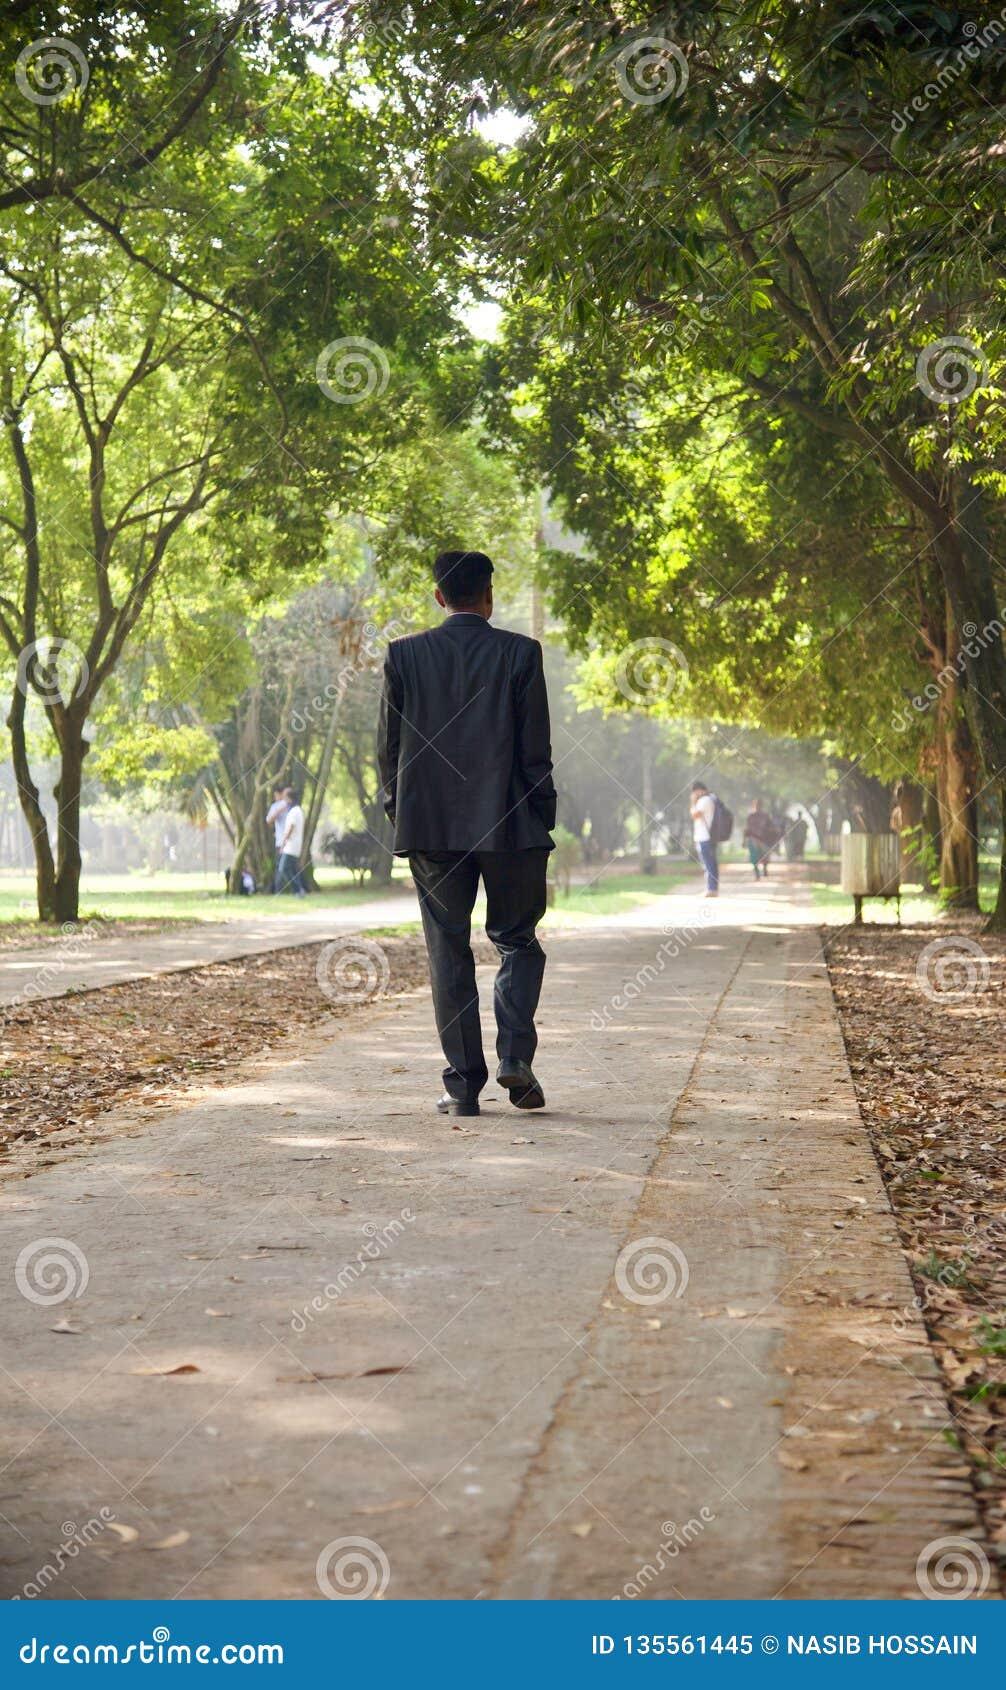 A man walking around a park way unique photo